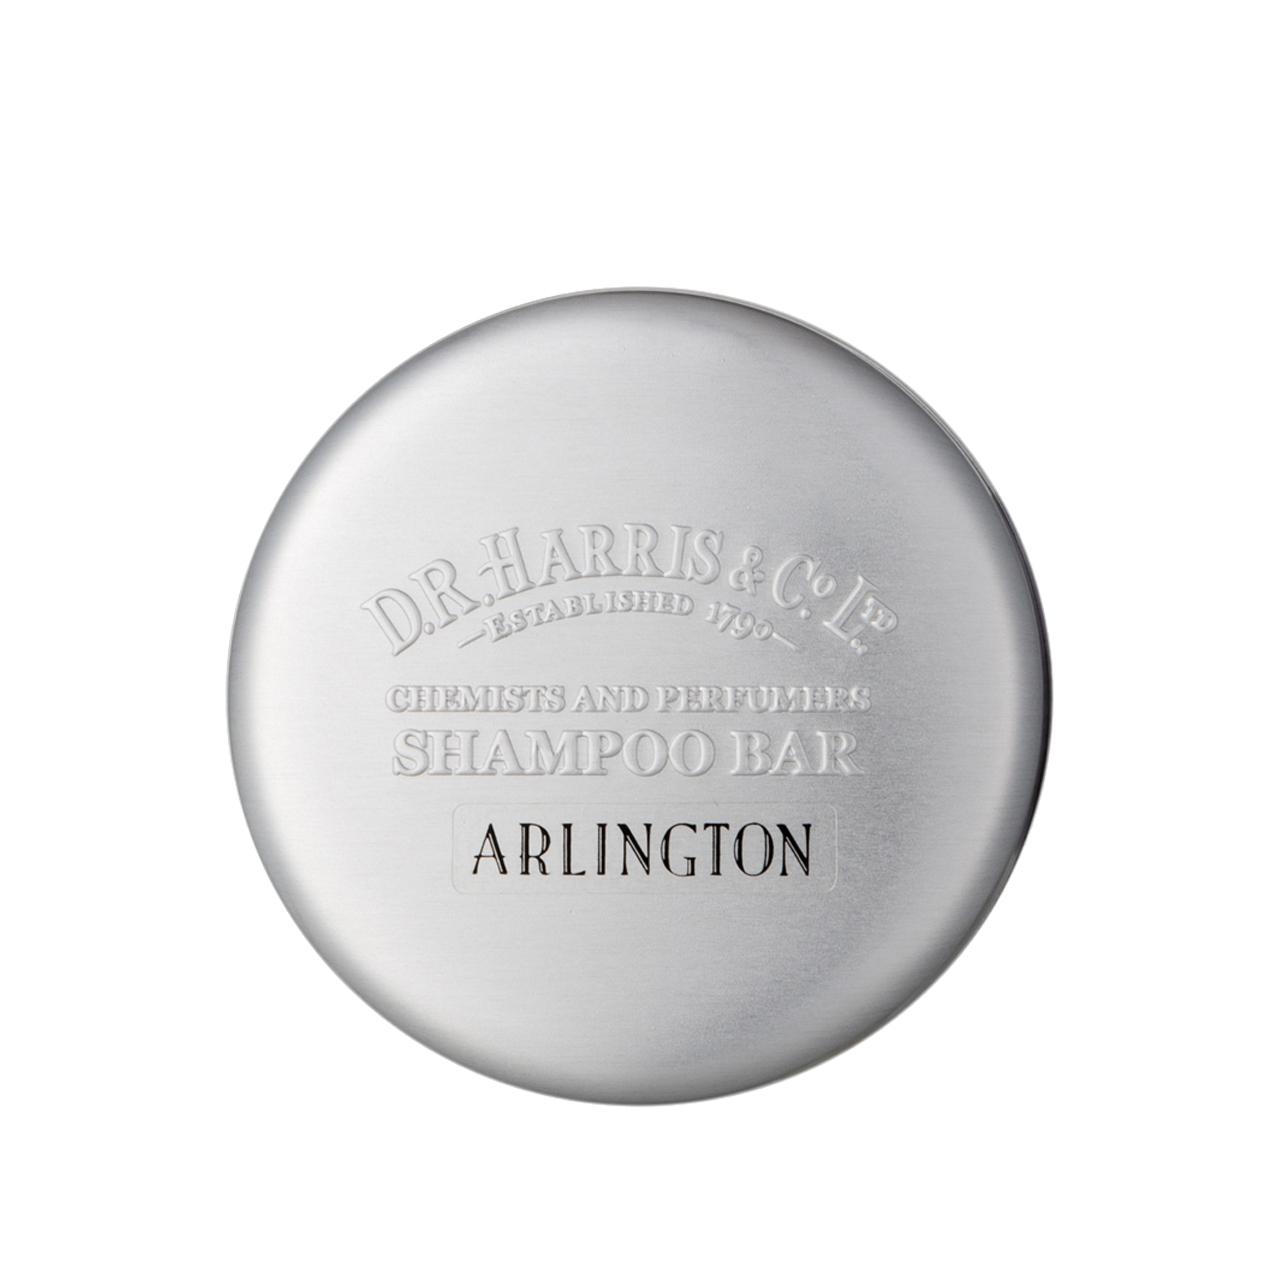 Arlington - Shampoo Bar